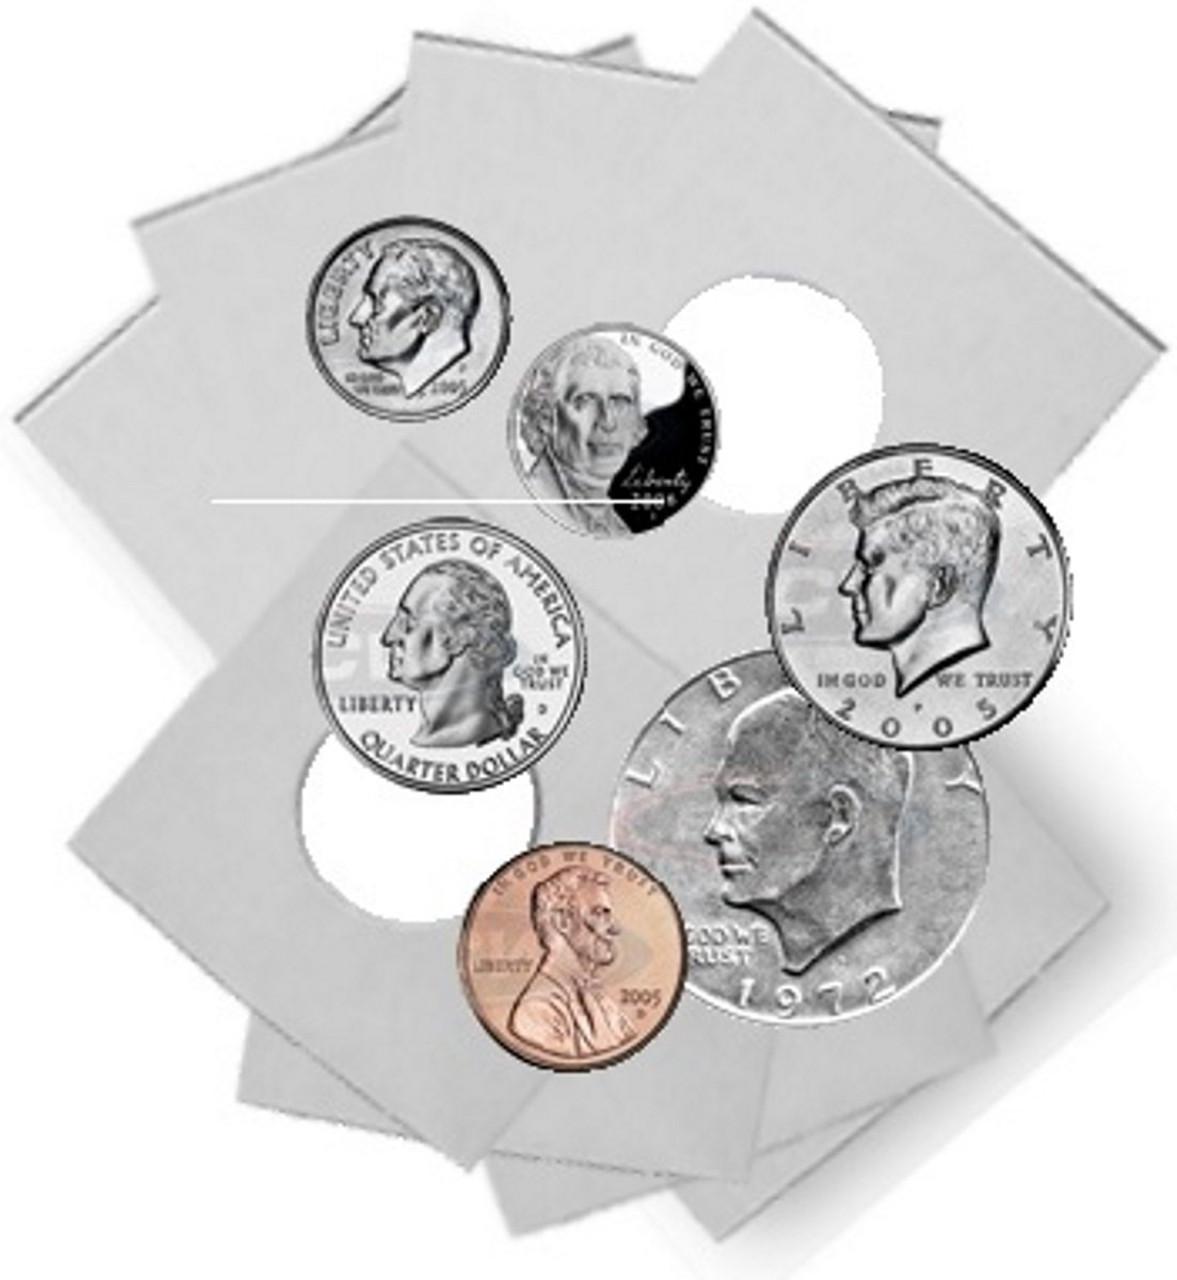 1,000 2x2 Holders 7 Different Sizes Coin Flip Mega Assortment